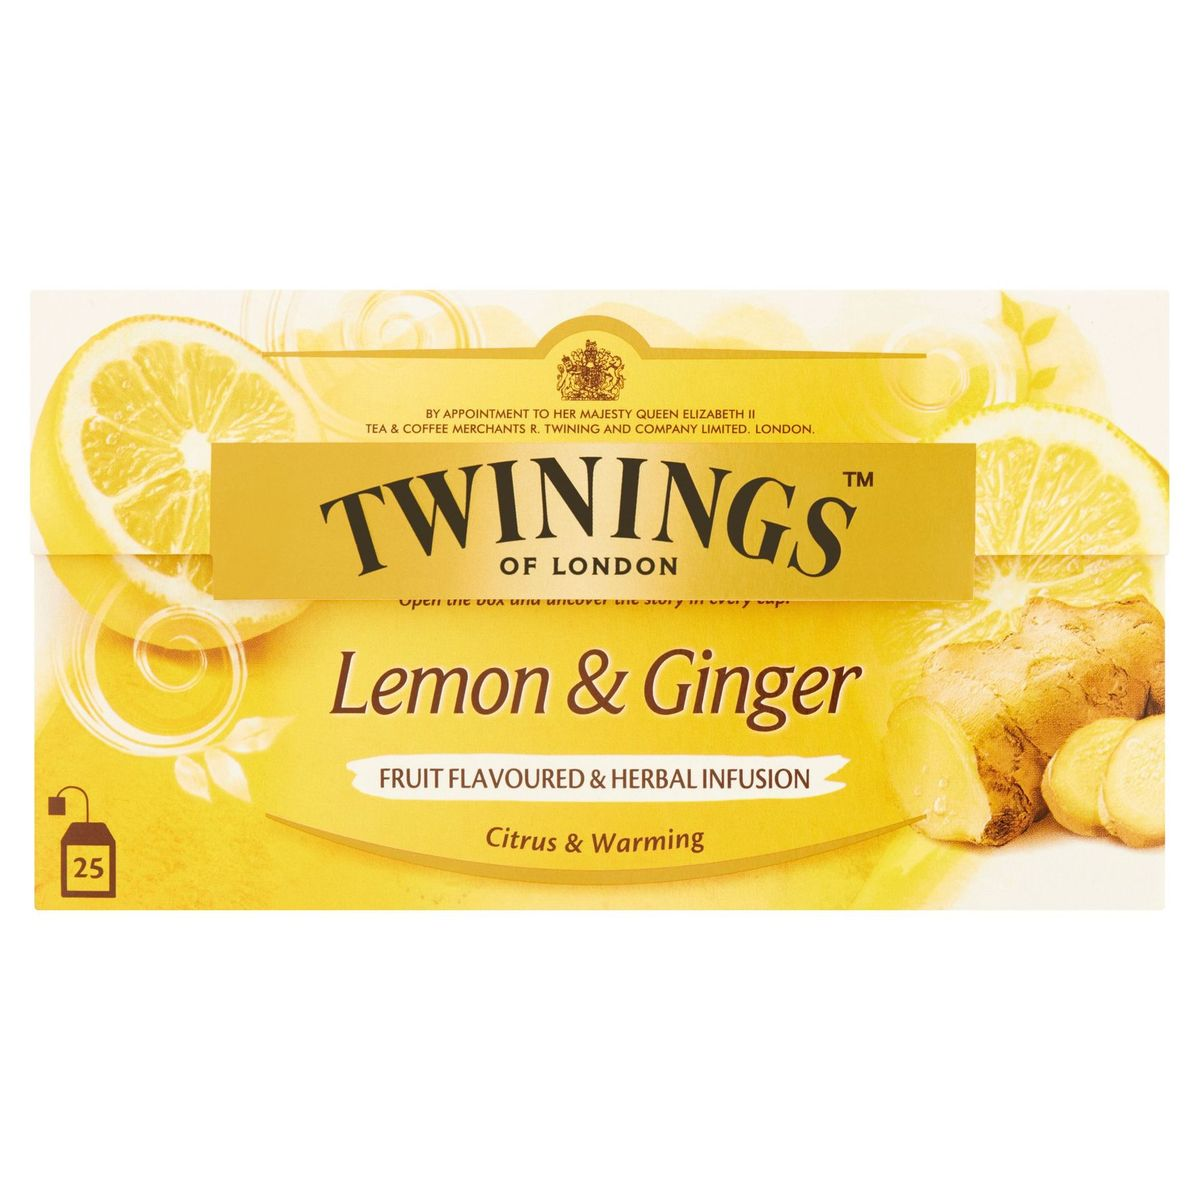 Twinings of London Lemon & Ginger 25 x 1.5 g